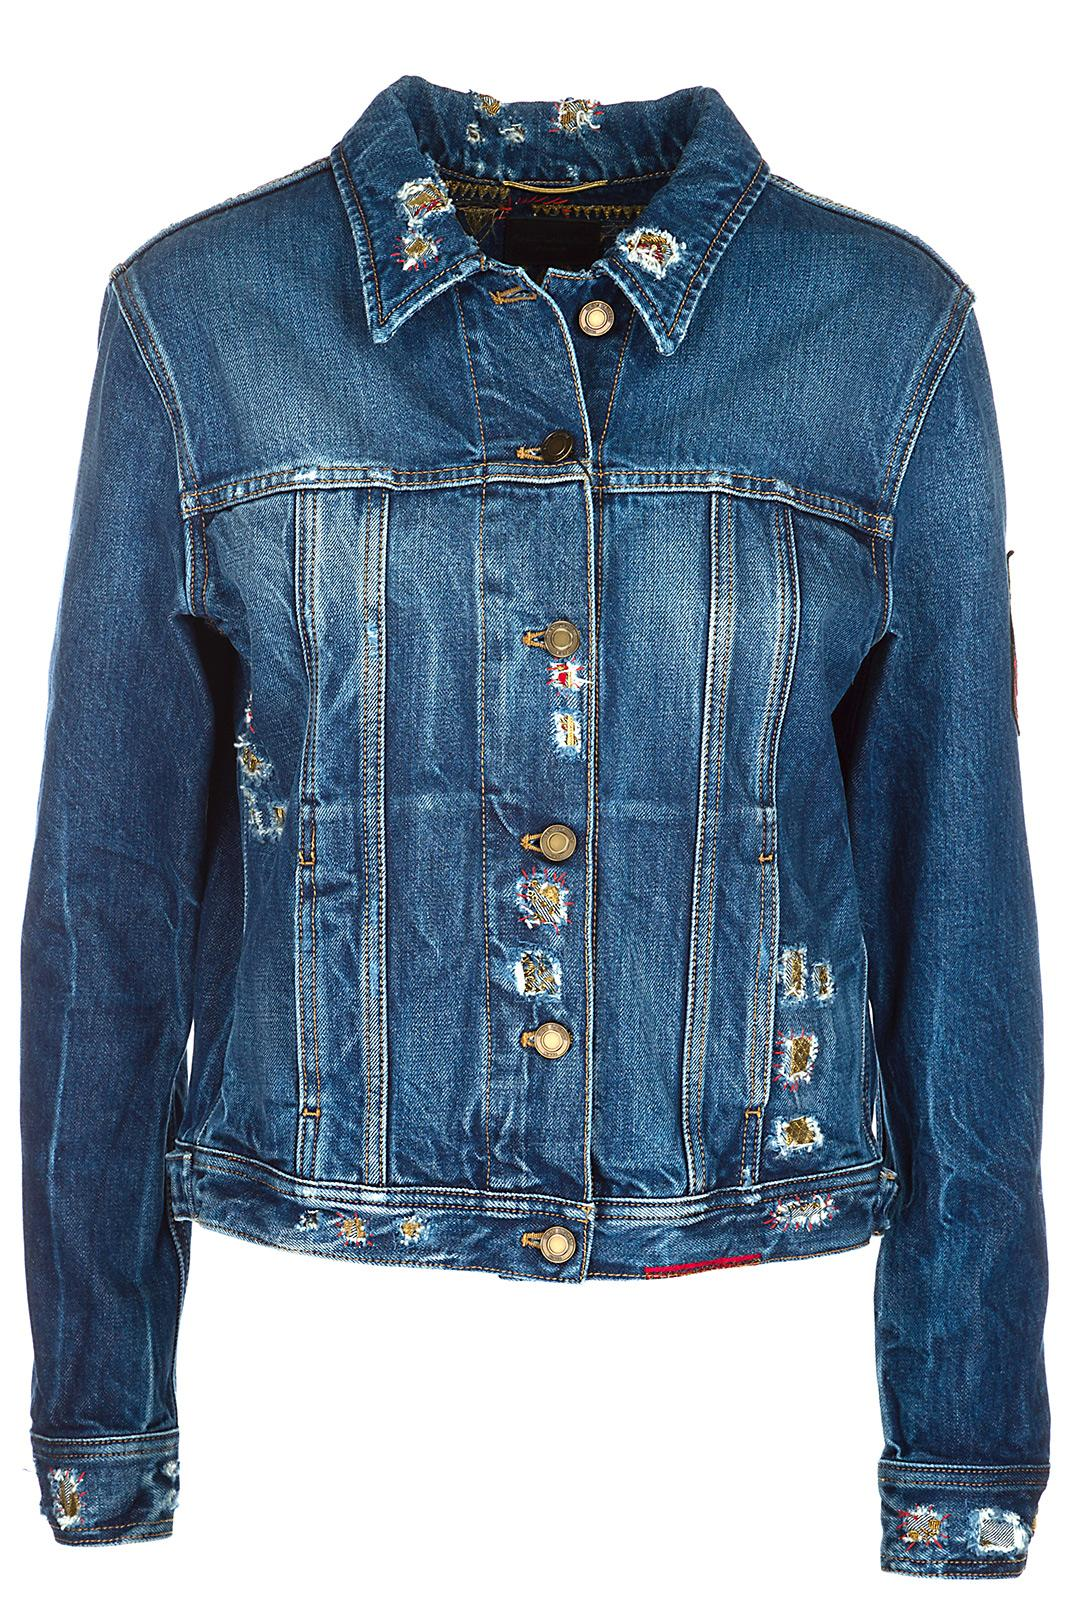 Saint Laurent Women's Denim Outerwear Jacket Blouson In Blue